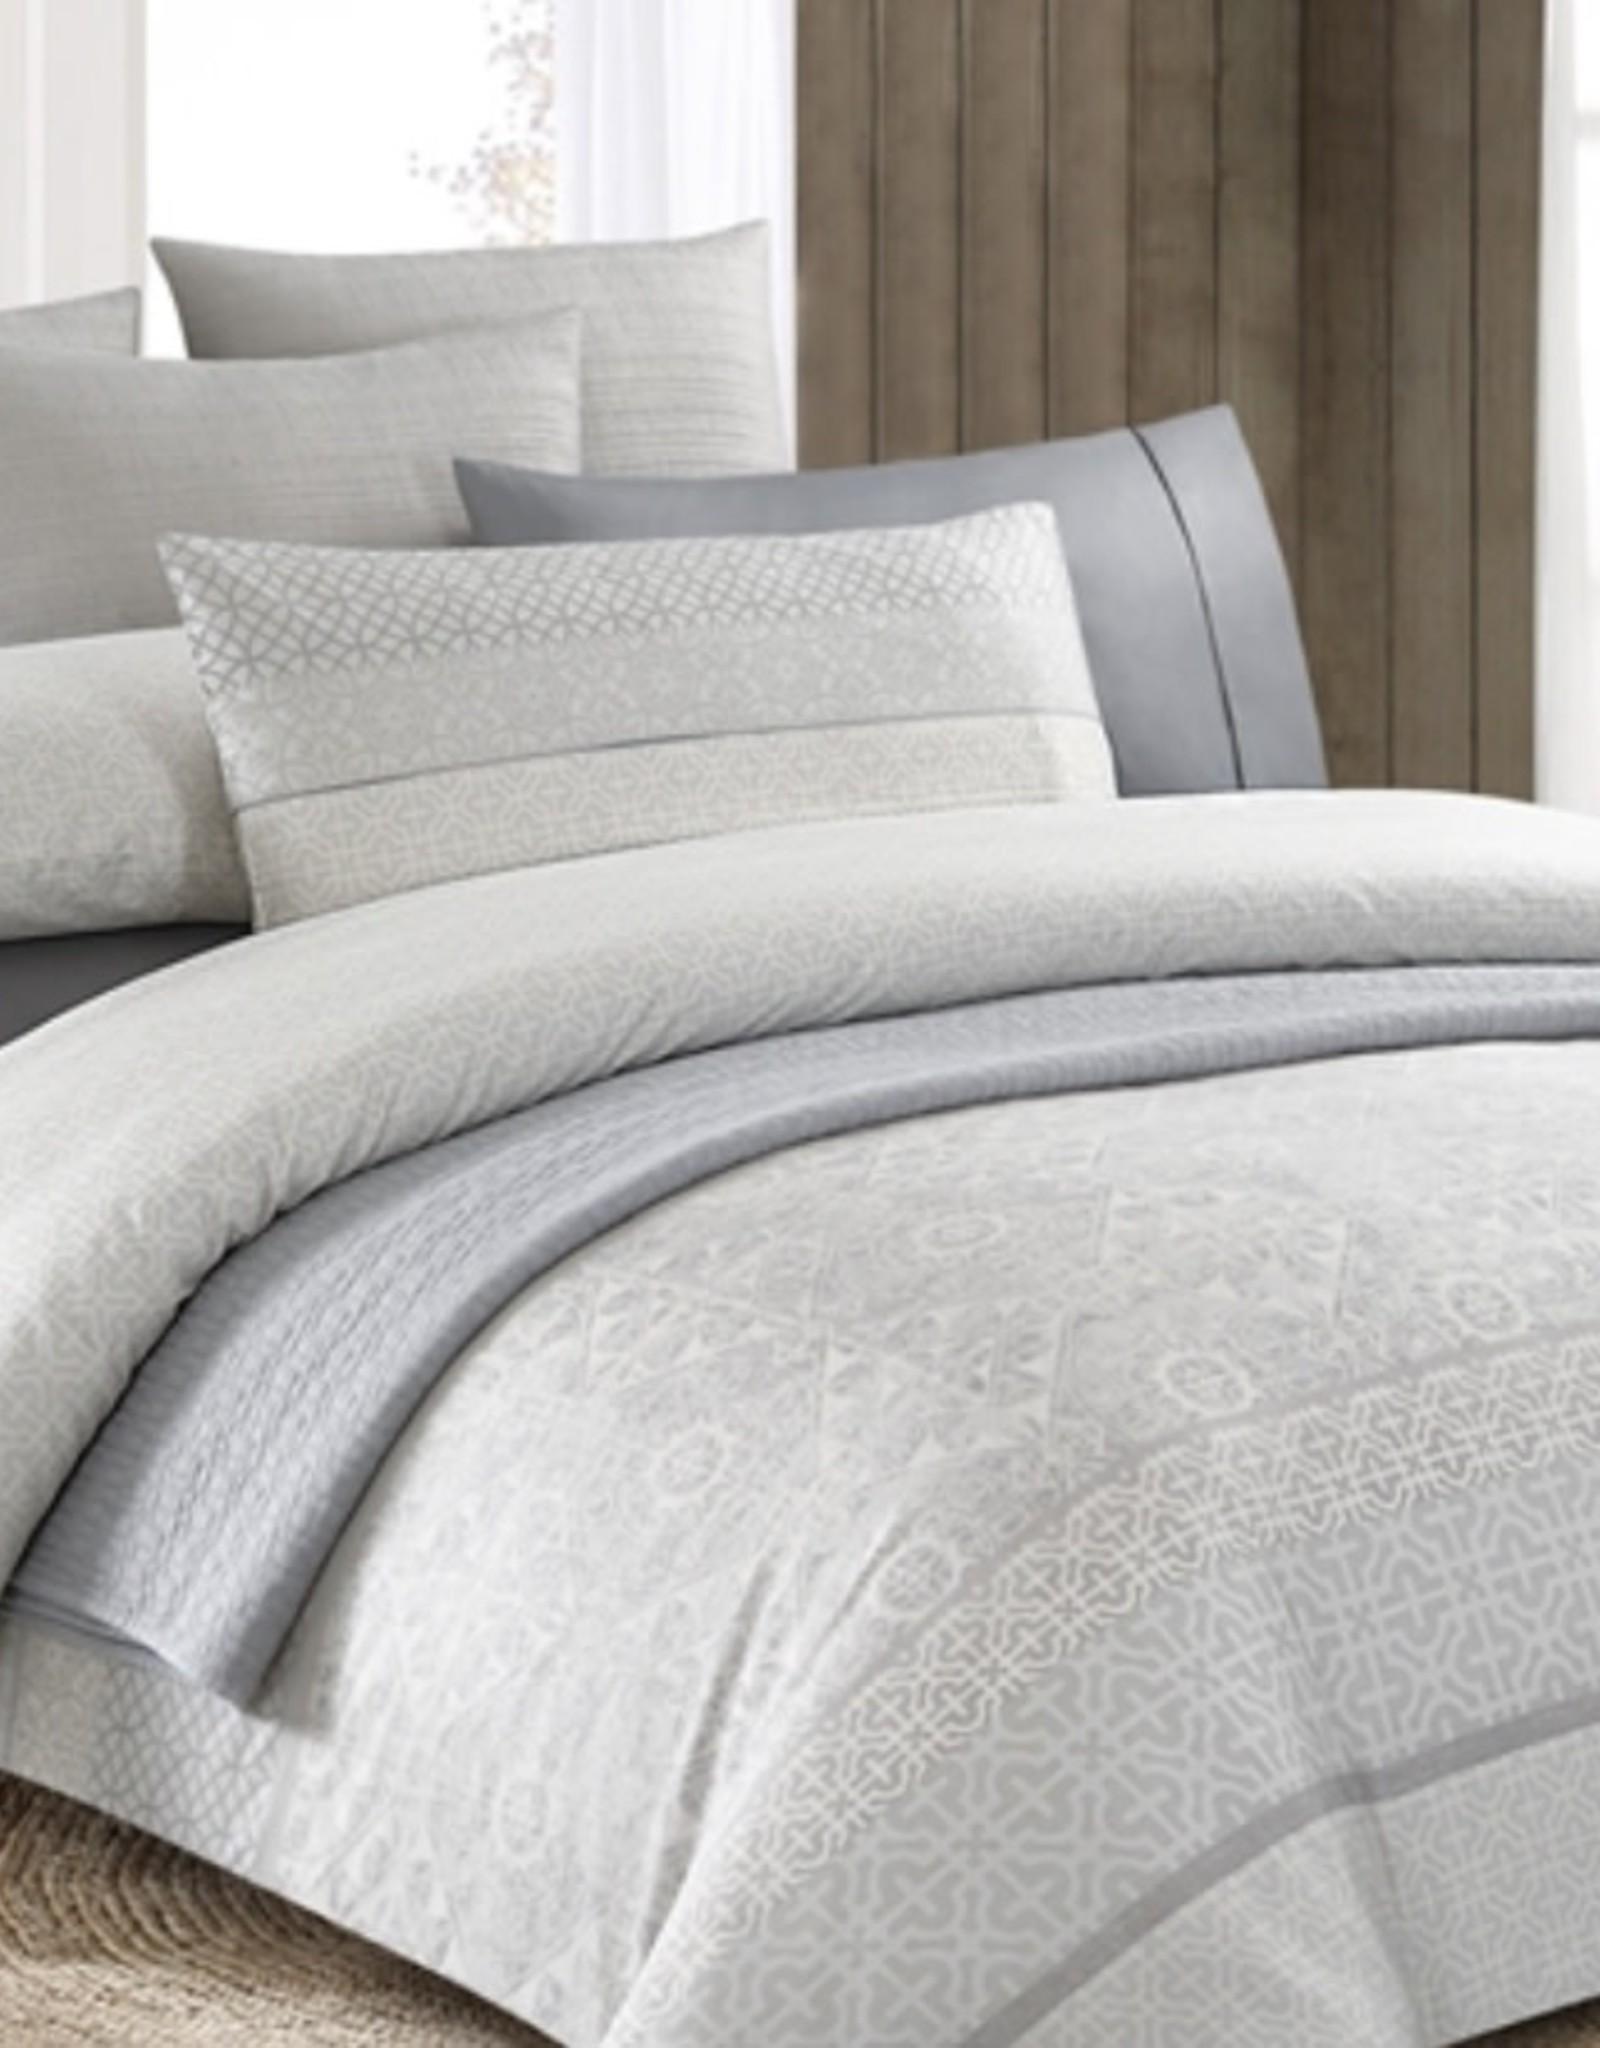 Daniadown Duvet Set Daniadown Amalfi King w / Pillow Cases